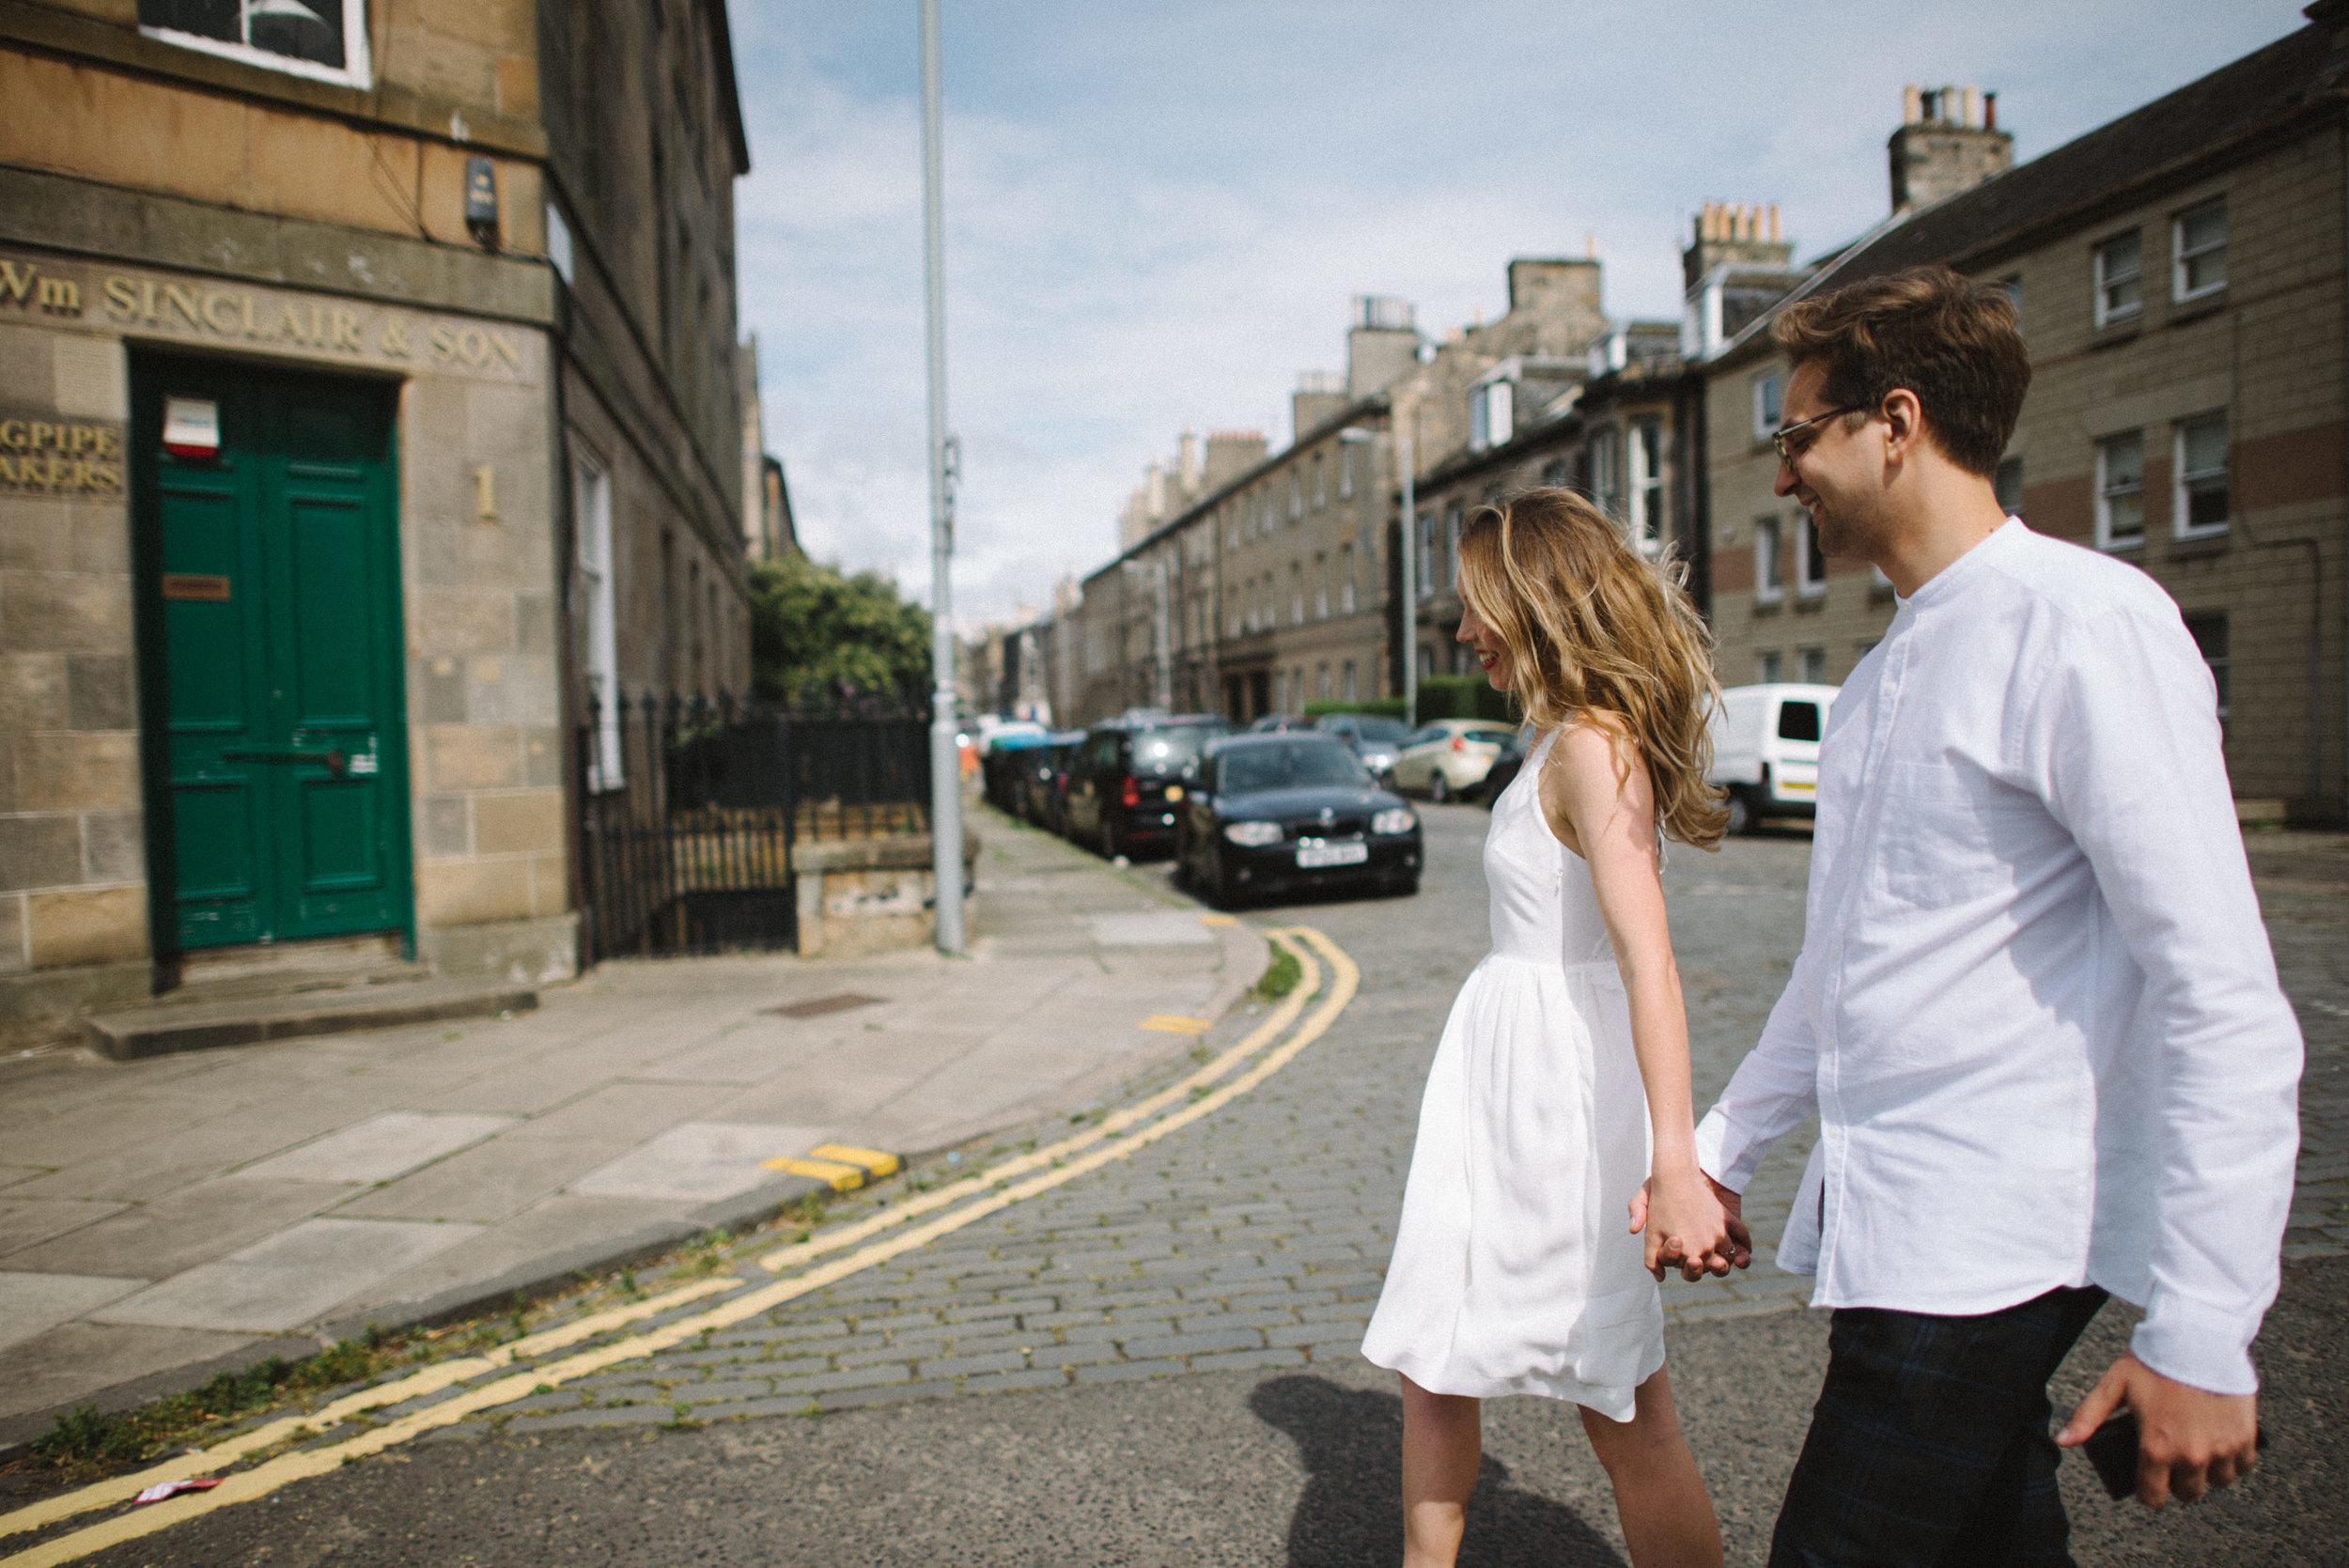 0108-LISA-DEVINE-PHOTOGRAPHY-ALTERNATIVE-WEDDING-PHOTOGRAPHY-SCOTLAND-DESTINATION-WEDDINGS-GLASGOW-WEDDINGS-COOL-WEDDINGS-STYLISH-WEDDINGS.JPG